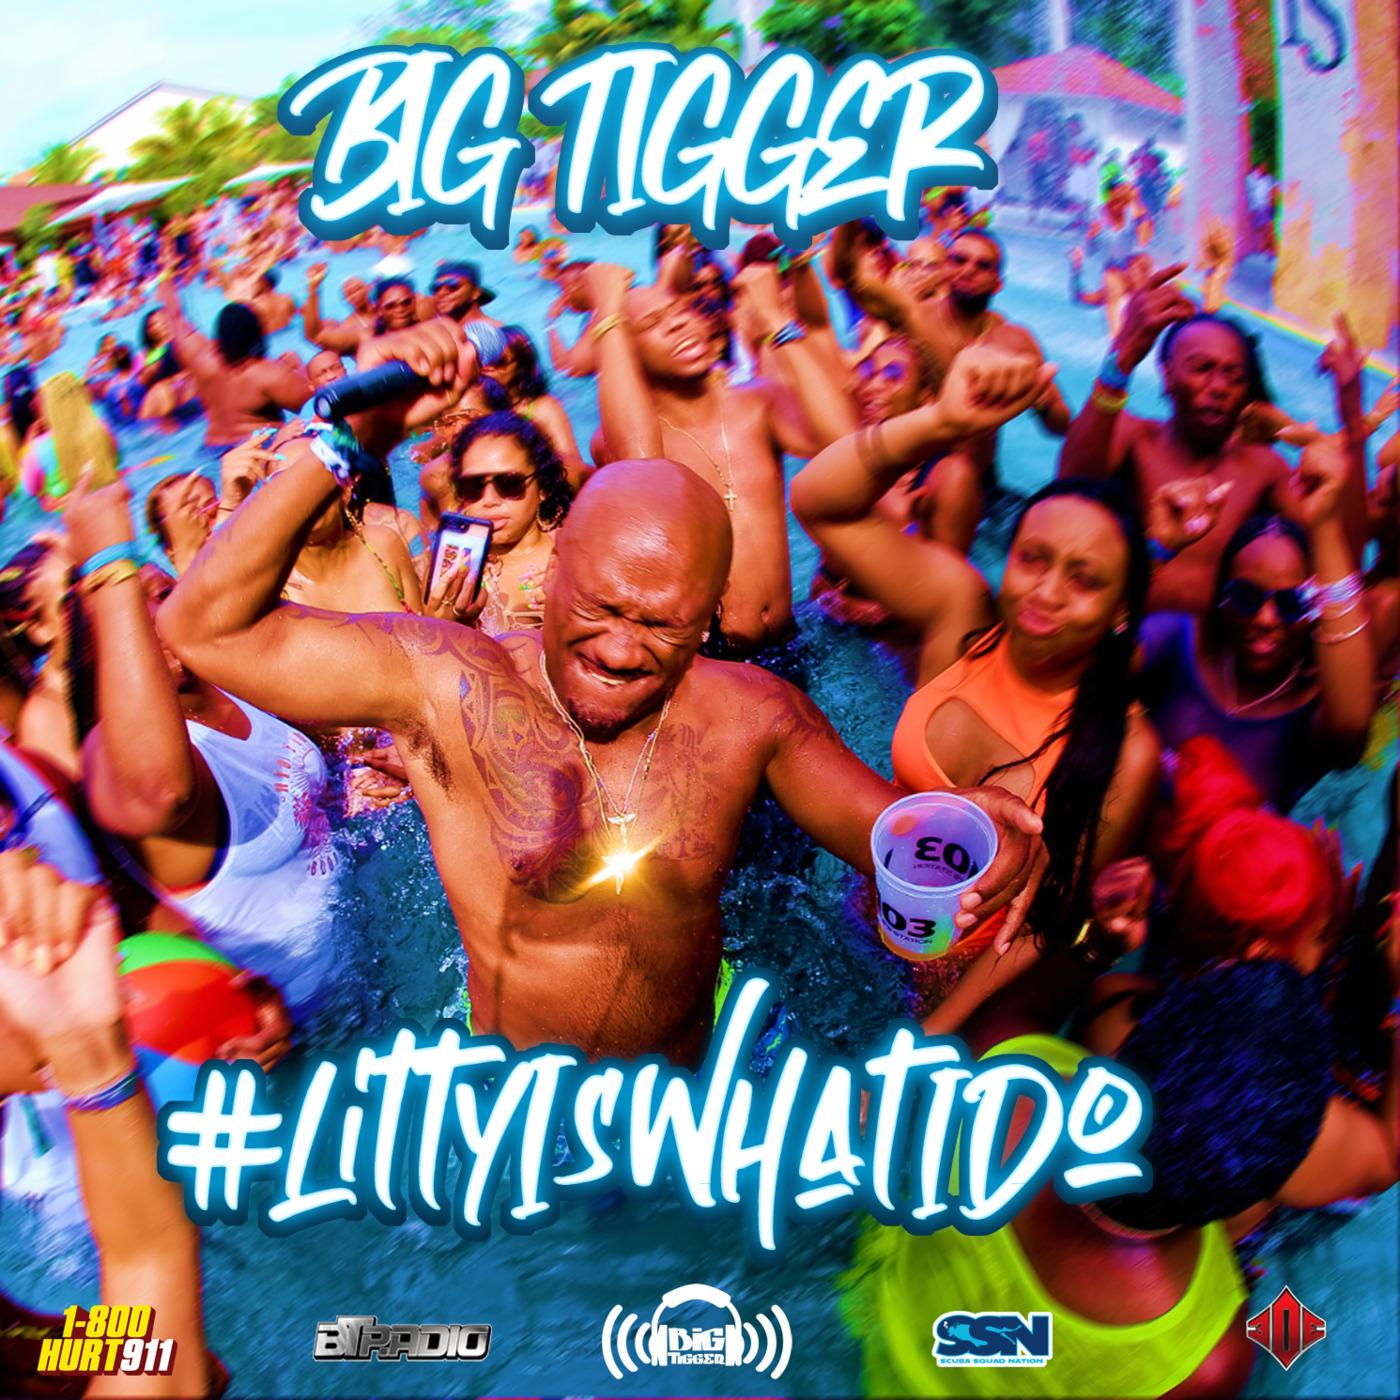 Best Episodes of DJ Enjay : Listen To My Vibe